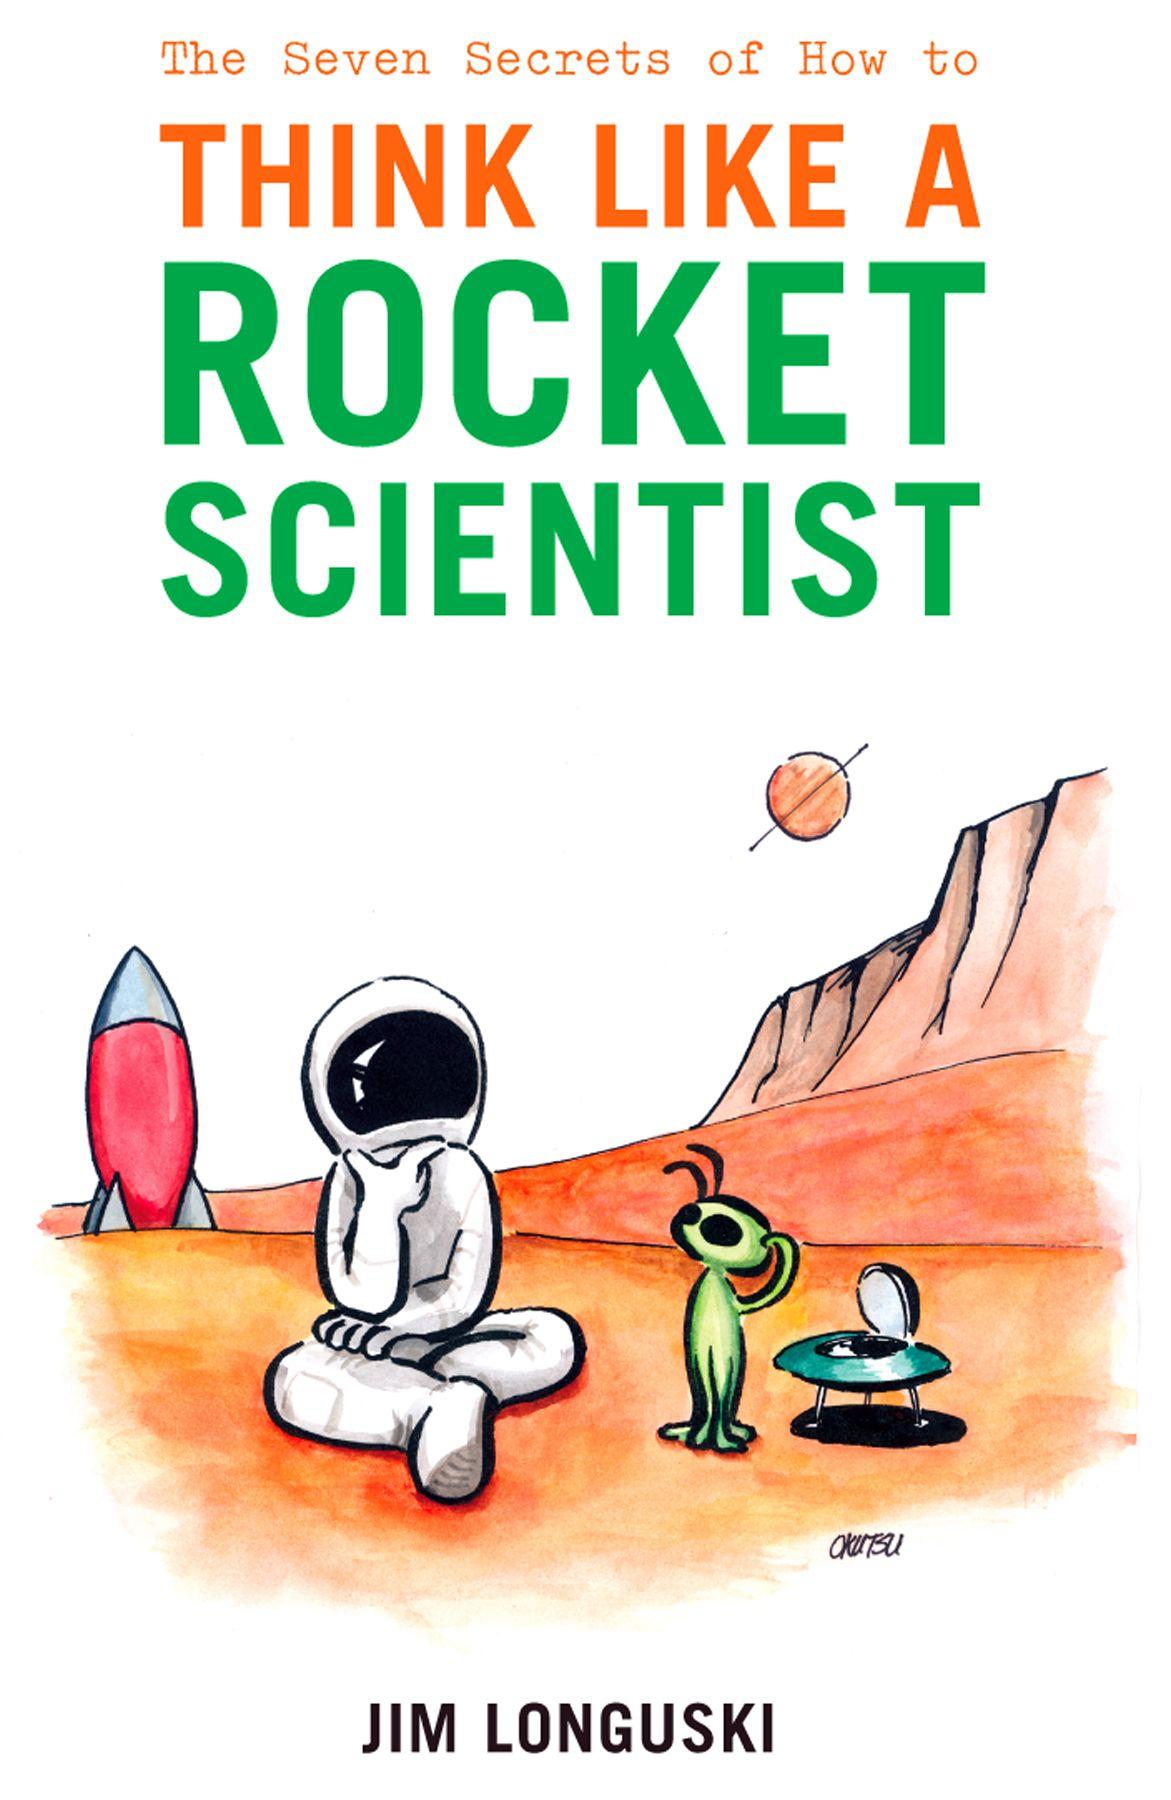 Rocket Scientist Jokes